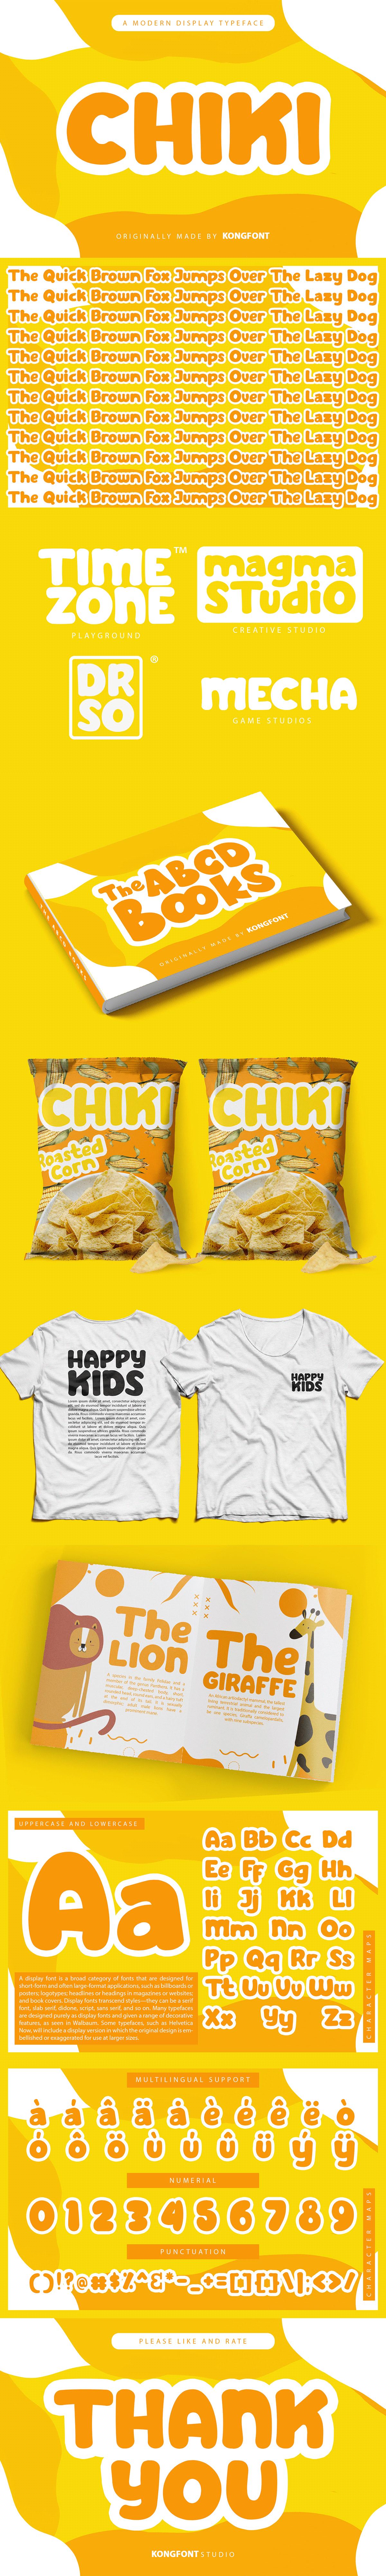 branding  cartoon chiki children cute Display font fonts Invitation Typeface